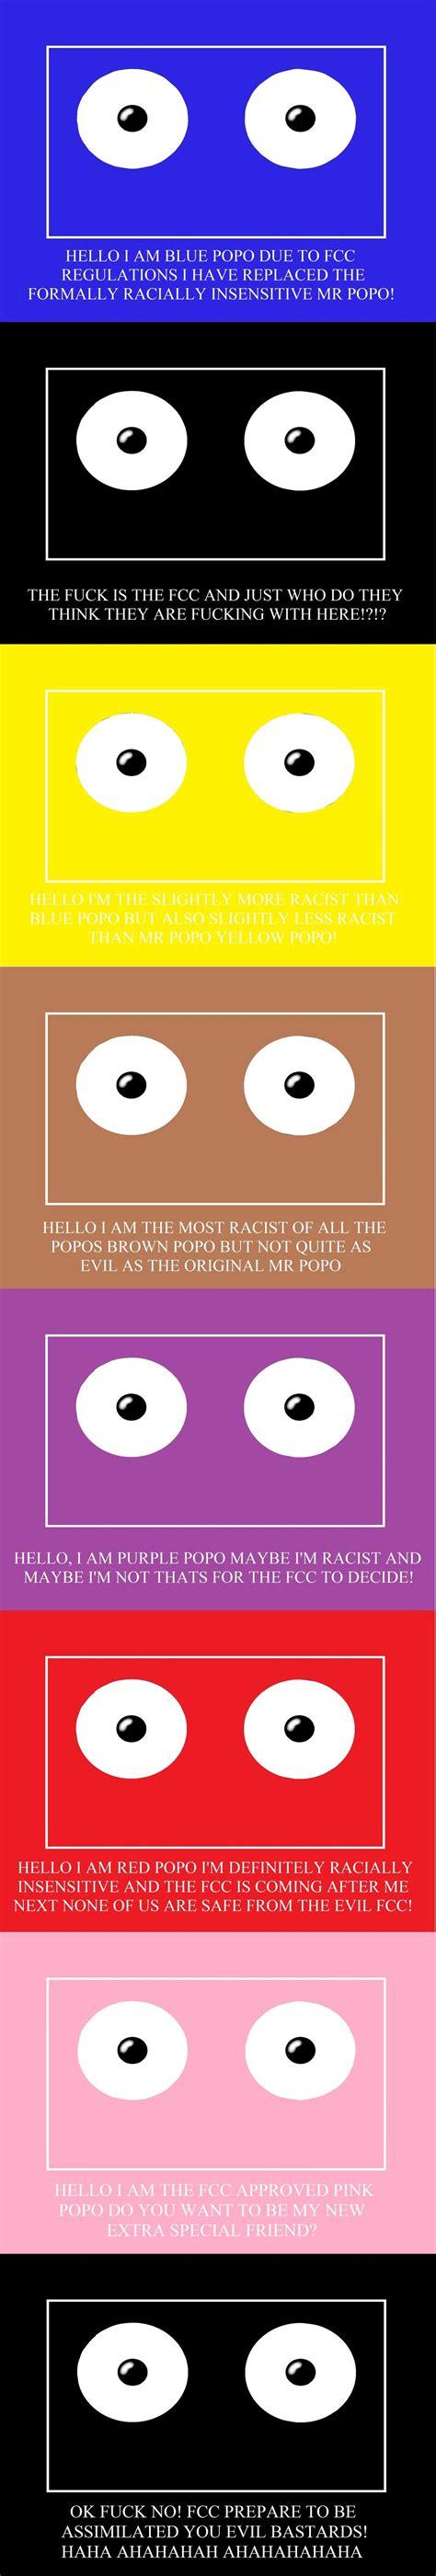 Popo Memes - mr popo demotivational meme by thesalsaman on deviantart